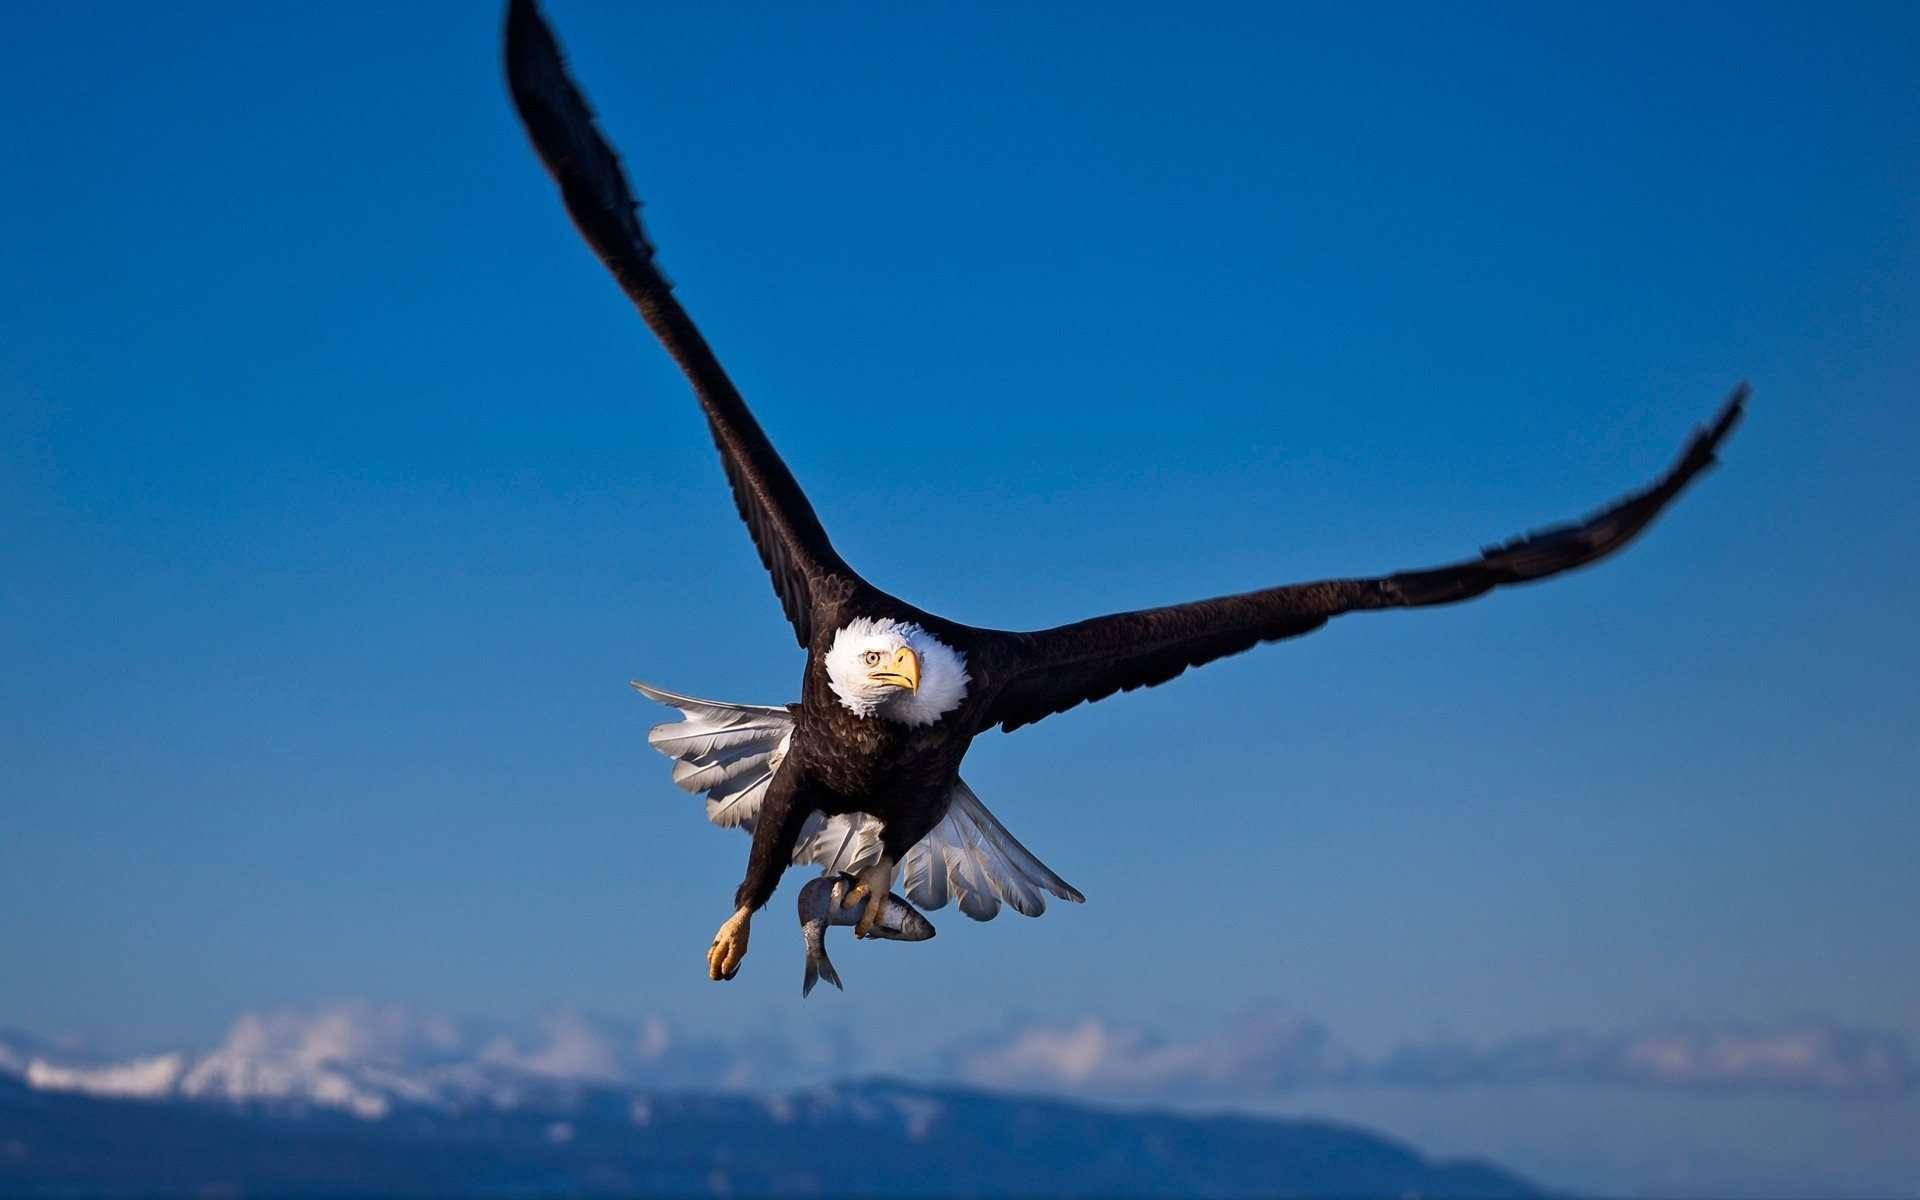 Hd wallpaper eagle - Bald Eagle Wallpapers Hd Wallpapers Inn